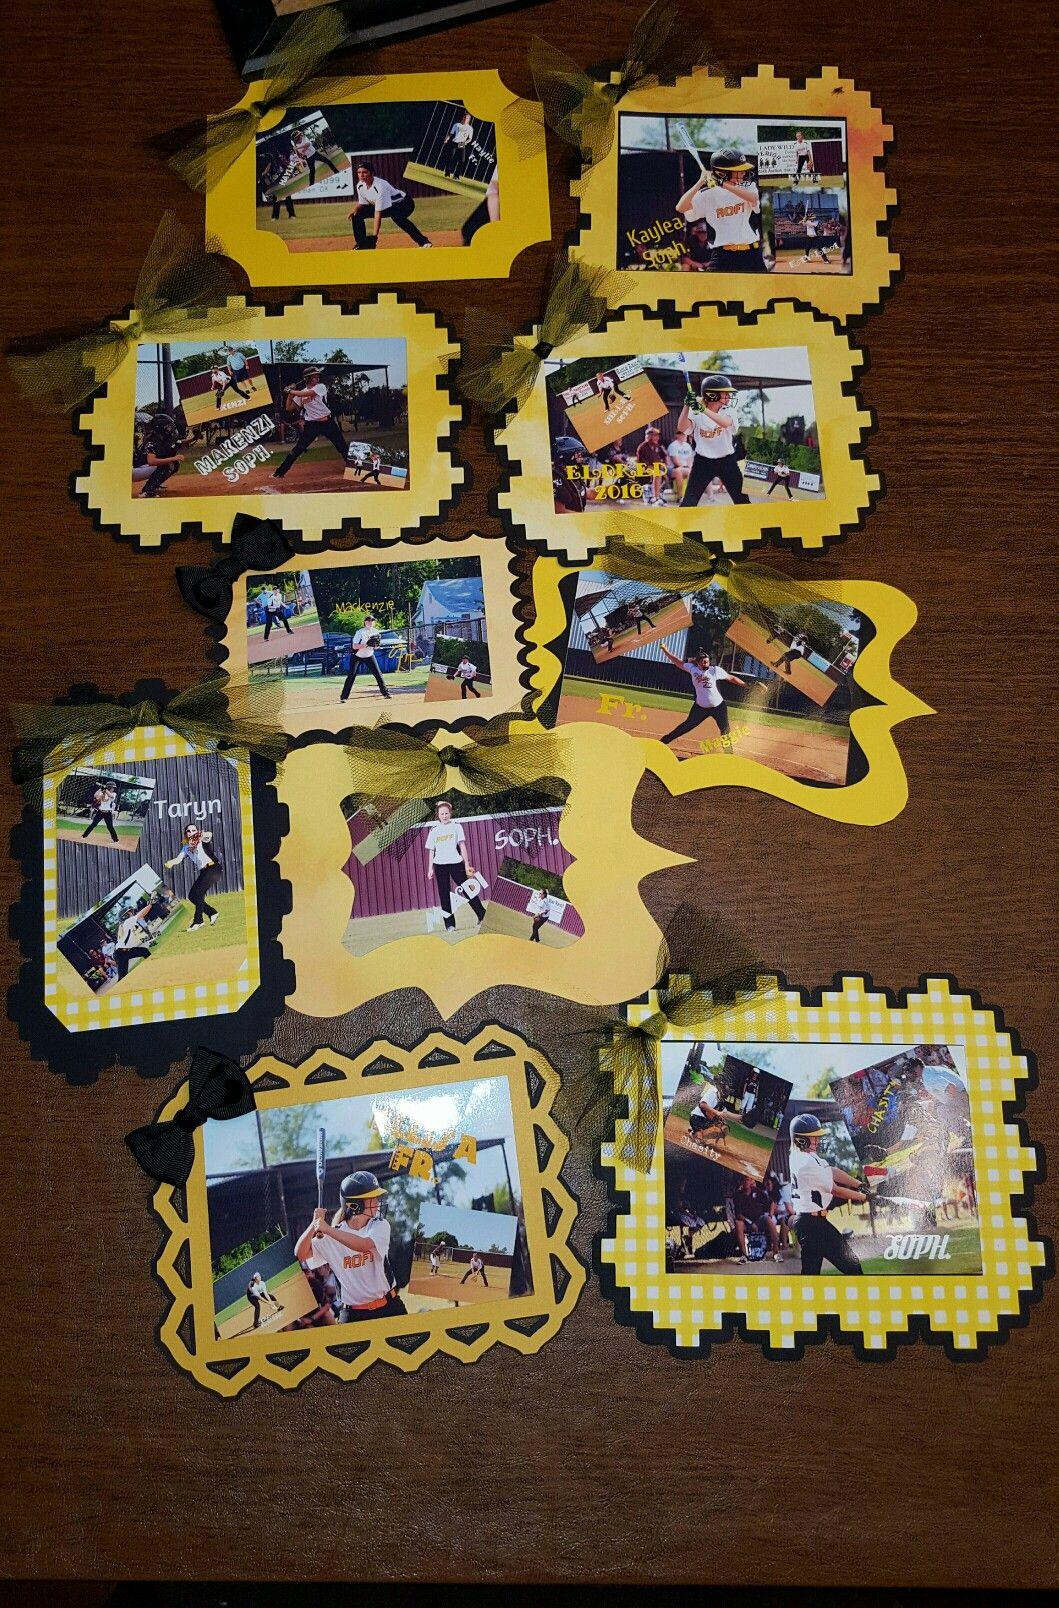 Softball frames | Softball | Pinterest | Softball and Frames